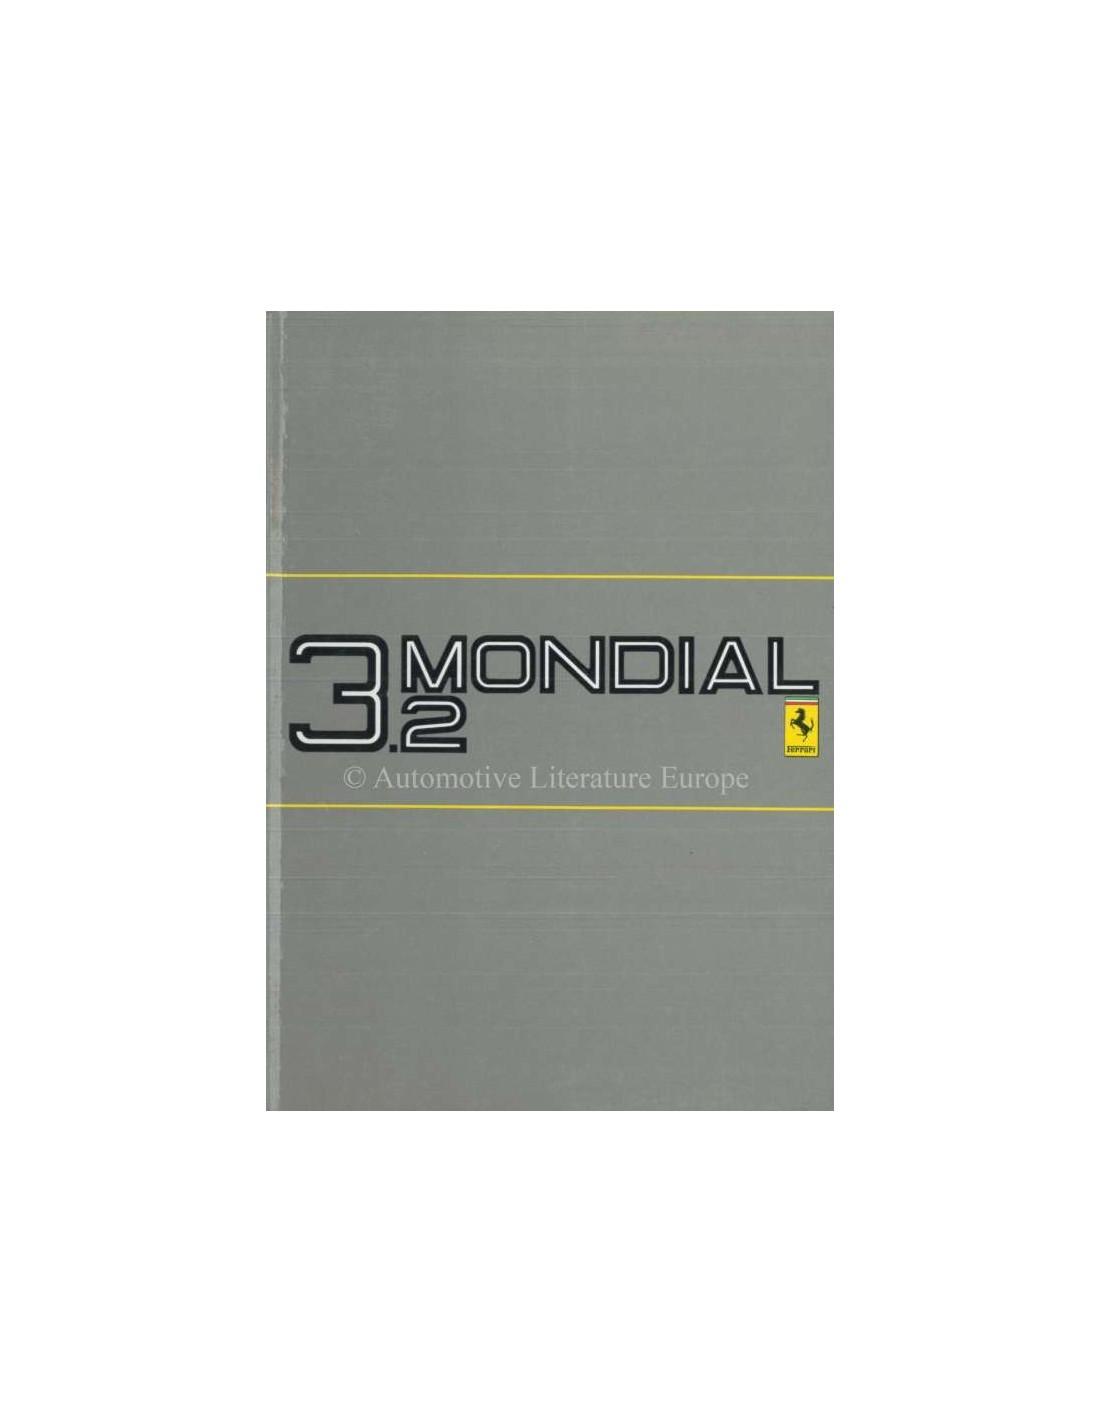 ferrari mondial service manual 1987 ferrari 3 2 mondial owner 39 s manual 474 87 purchase. Black Bedroom Furniture Sets. Home Design Ideas